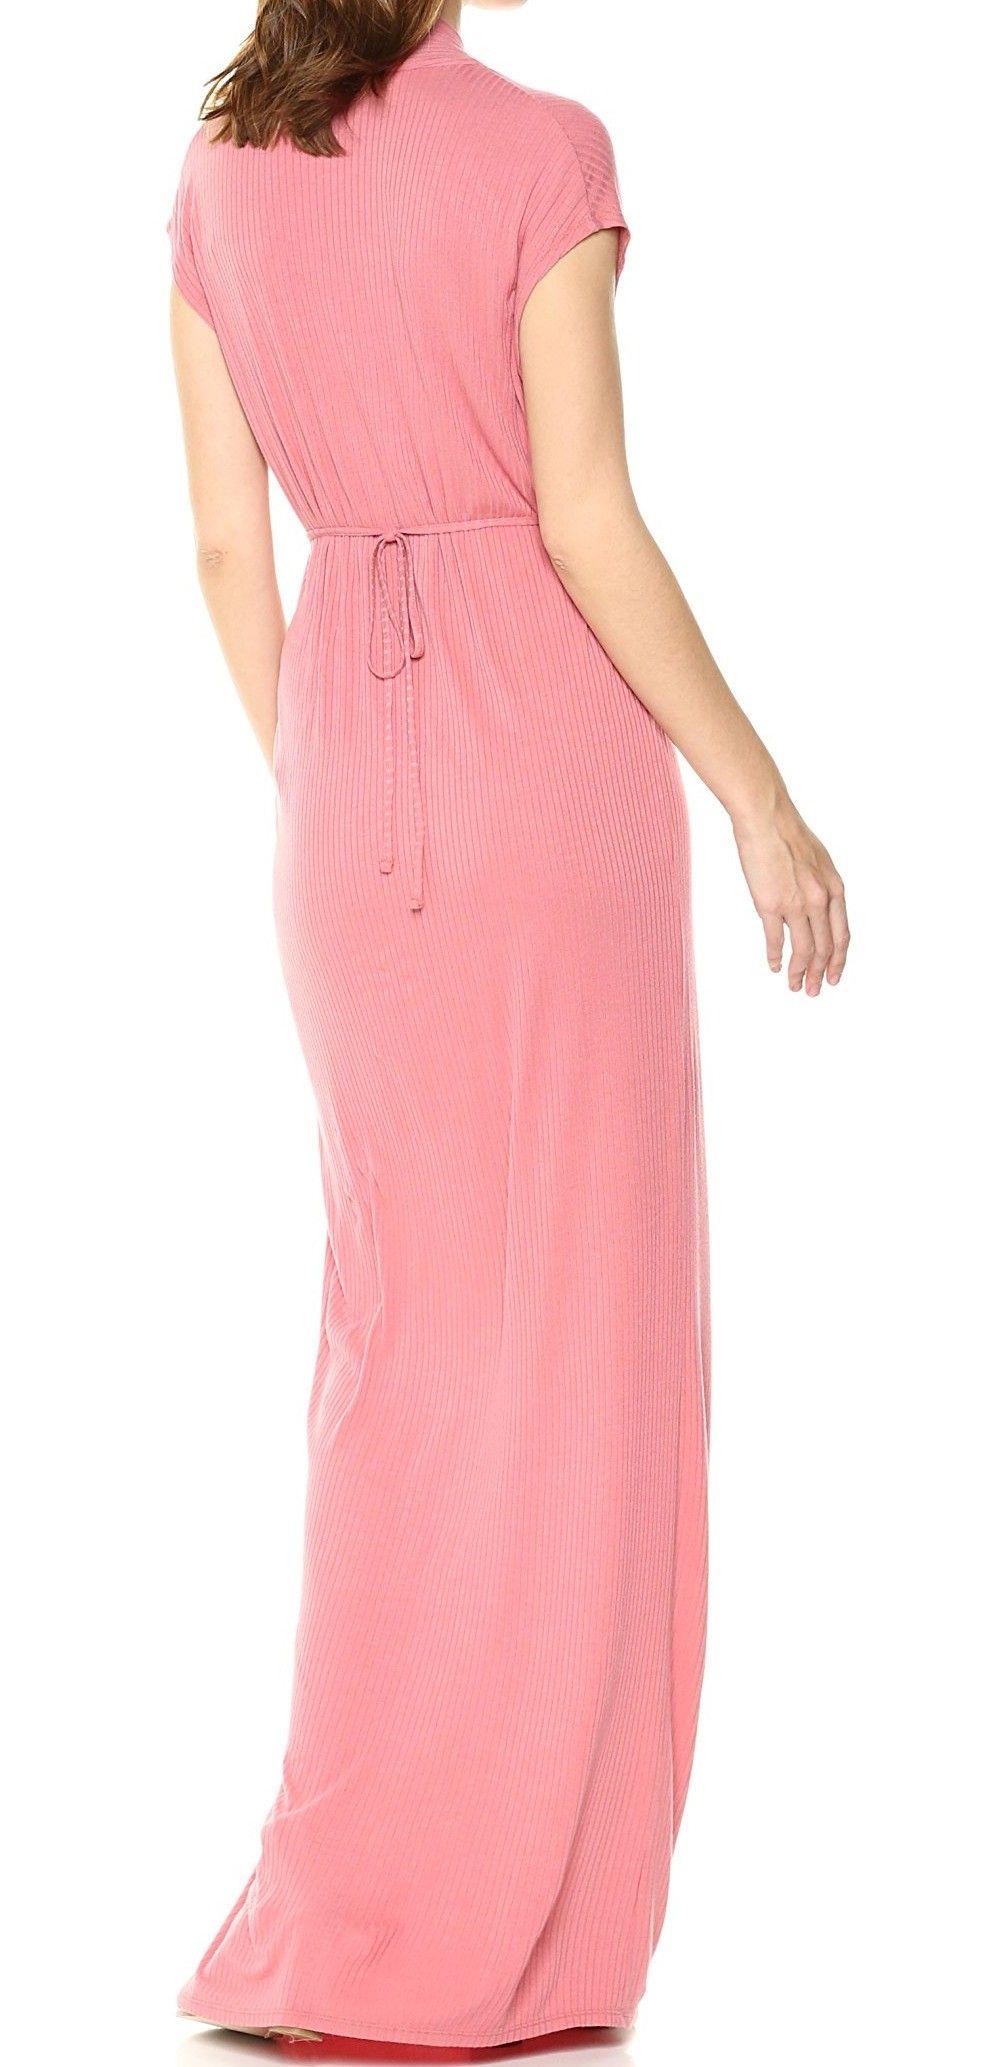 Lucky Brand Lucky Brand Womens Ribbed Maxi Dress Walmart Com Ribbed Maxi Dress Clothes Autumn Street Style [ 2067 x 994 Pixel ]